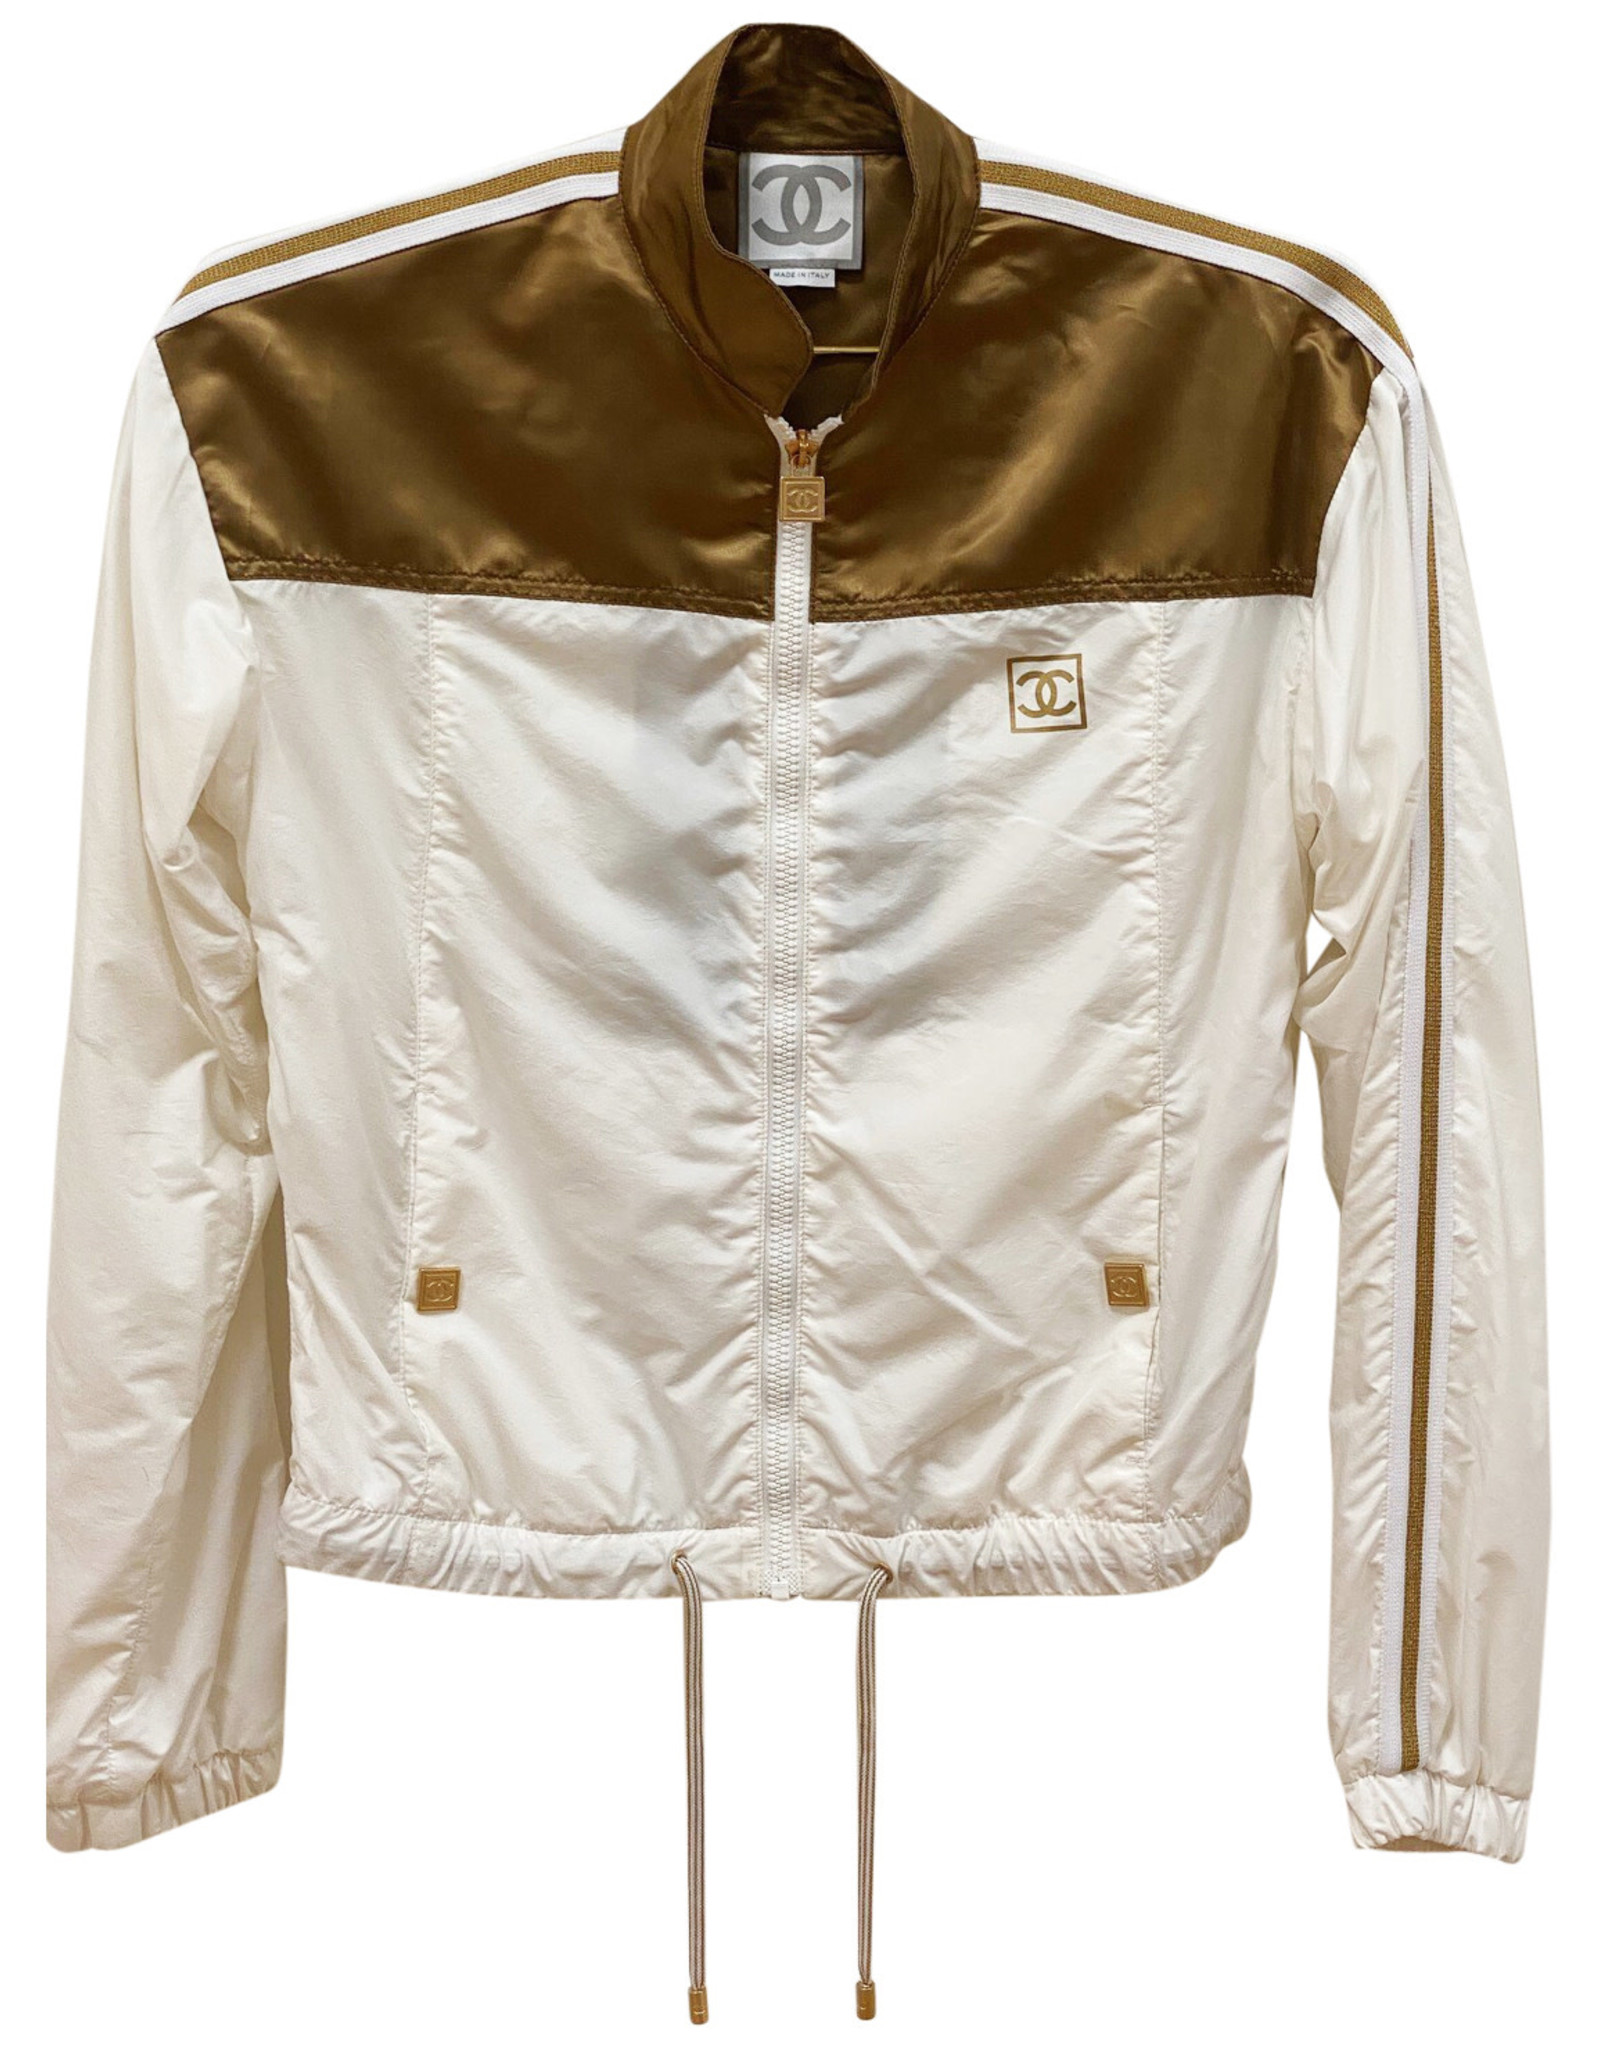 Wyld Blue Vintage Chanel White CC Logo Gold Sport Bomber Jacket (Sz FR 36/US 6)